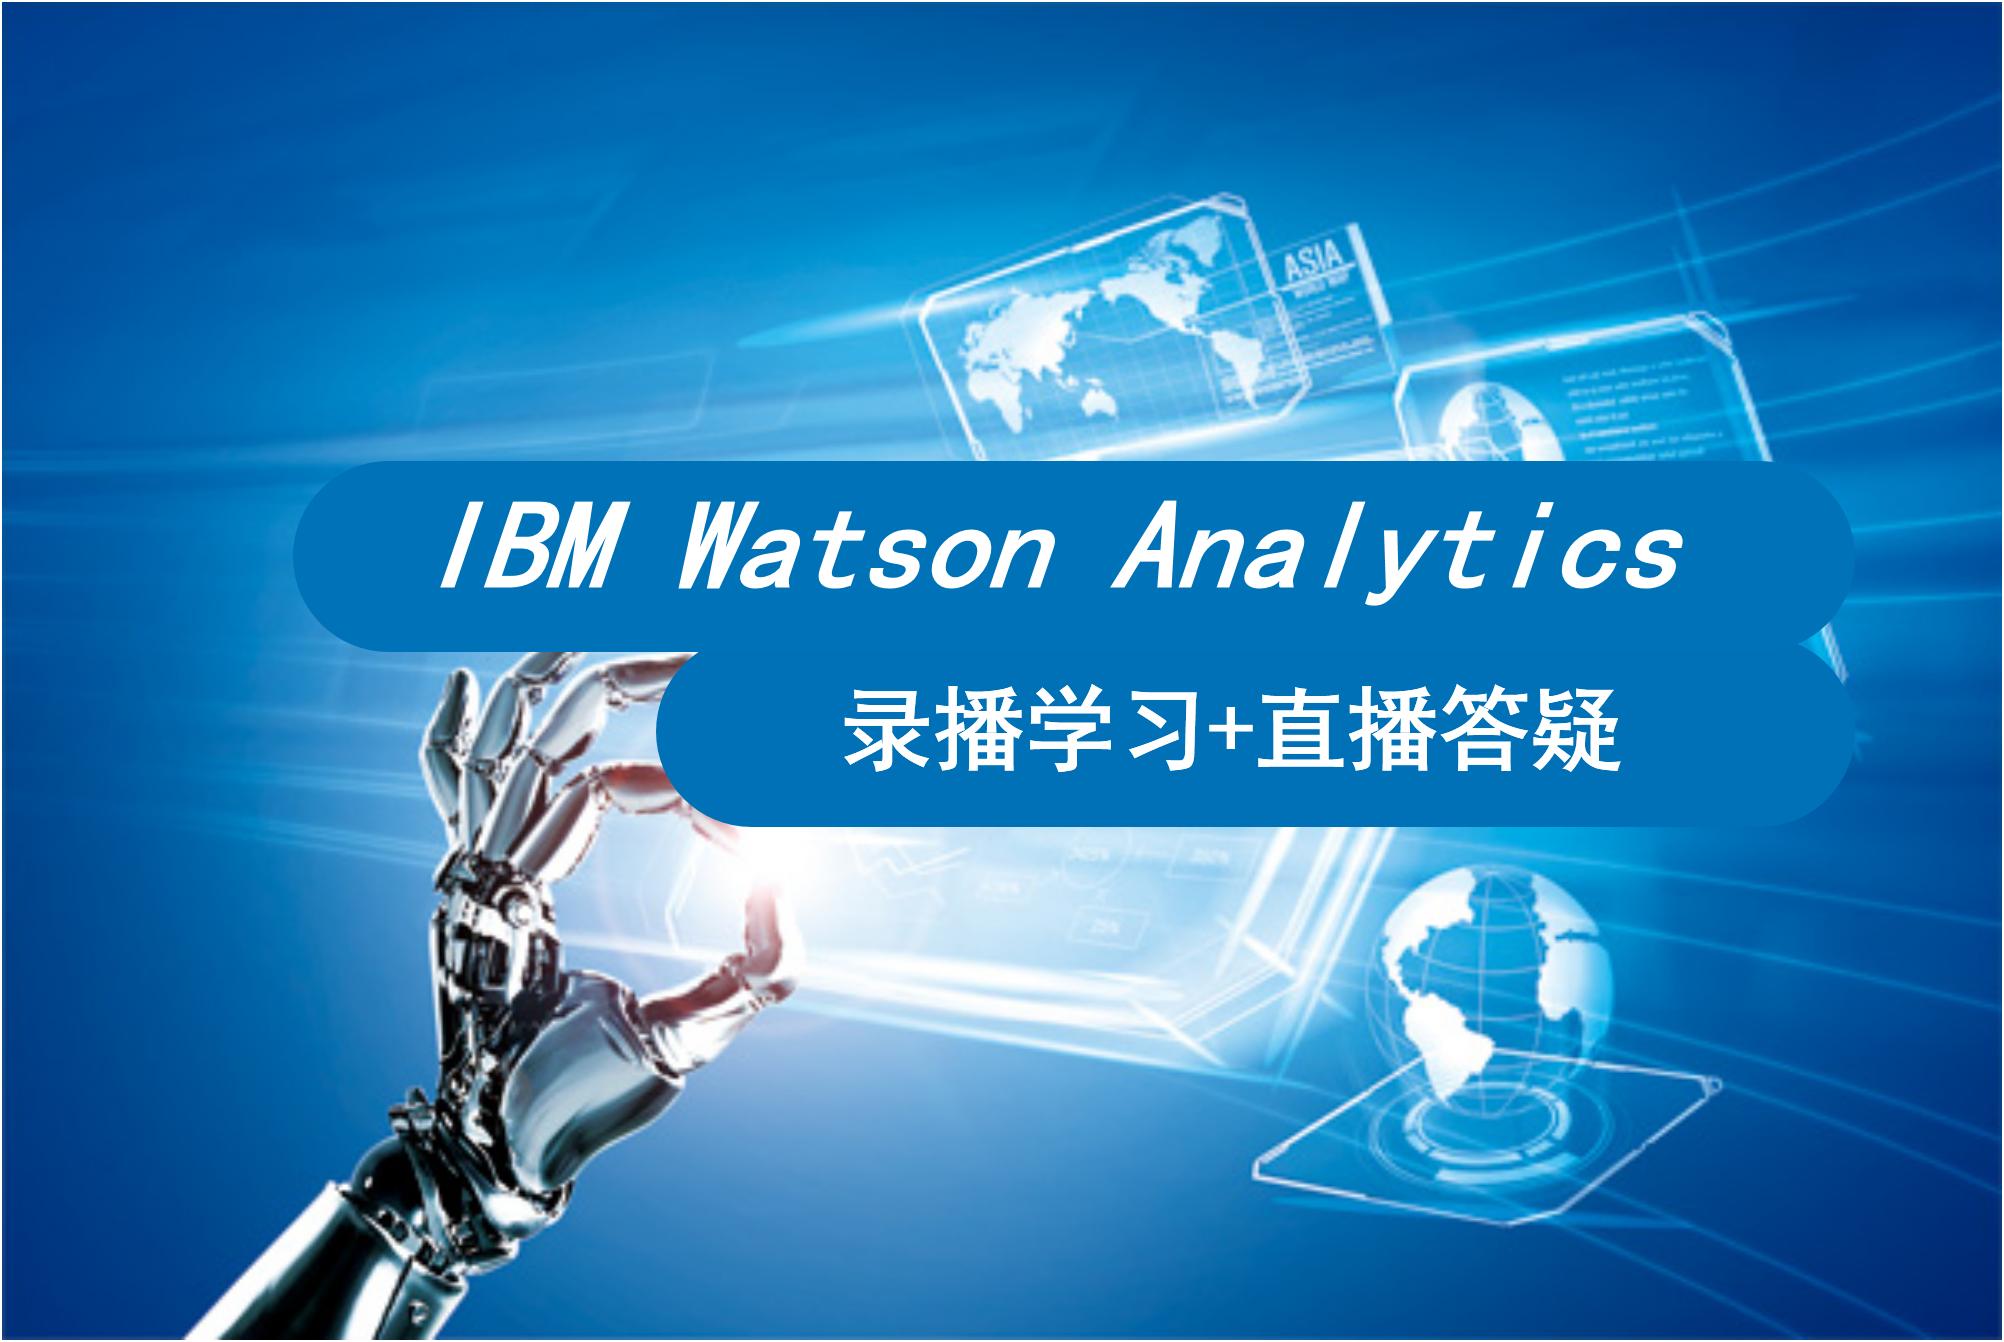 IBM Watson Analytics Demo for Insurance Industry